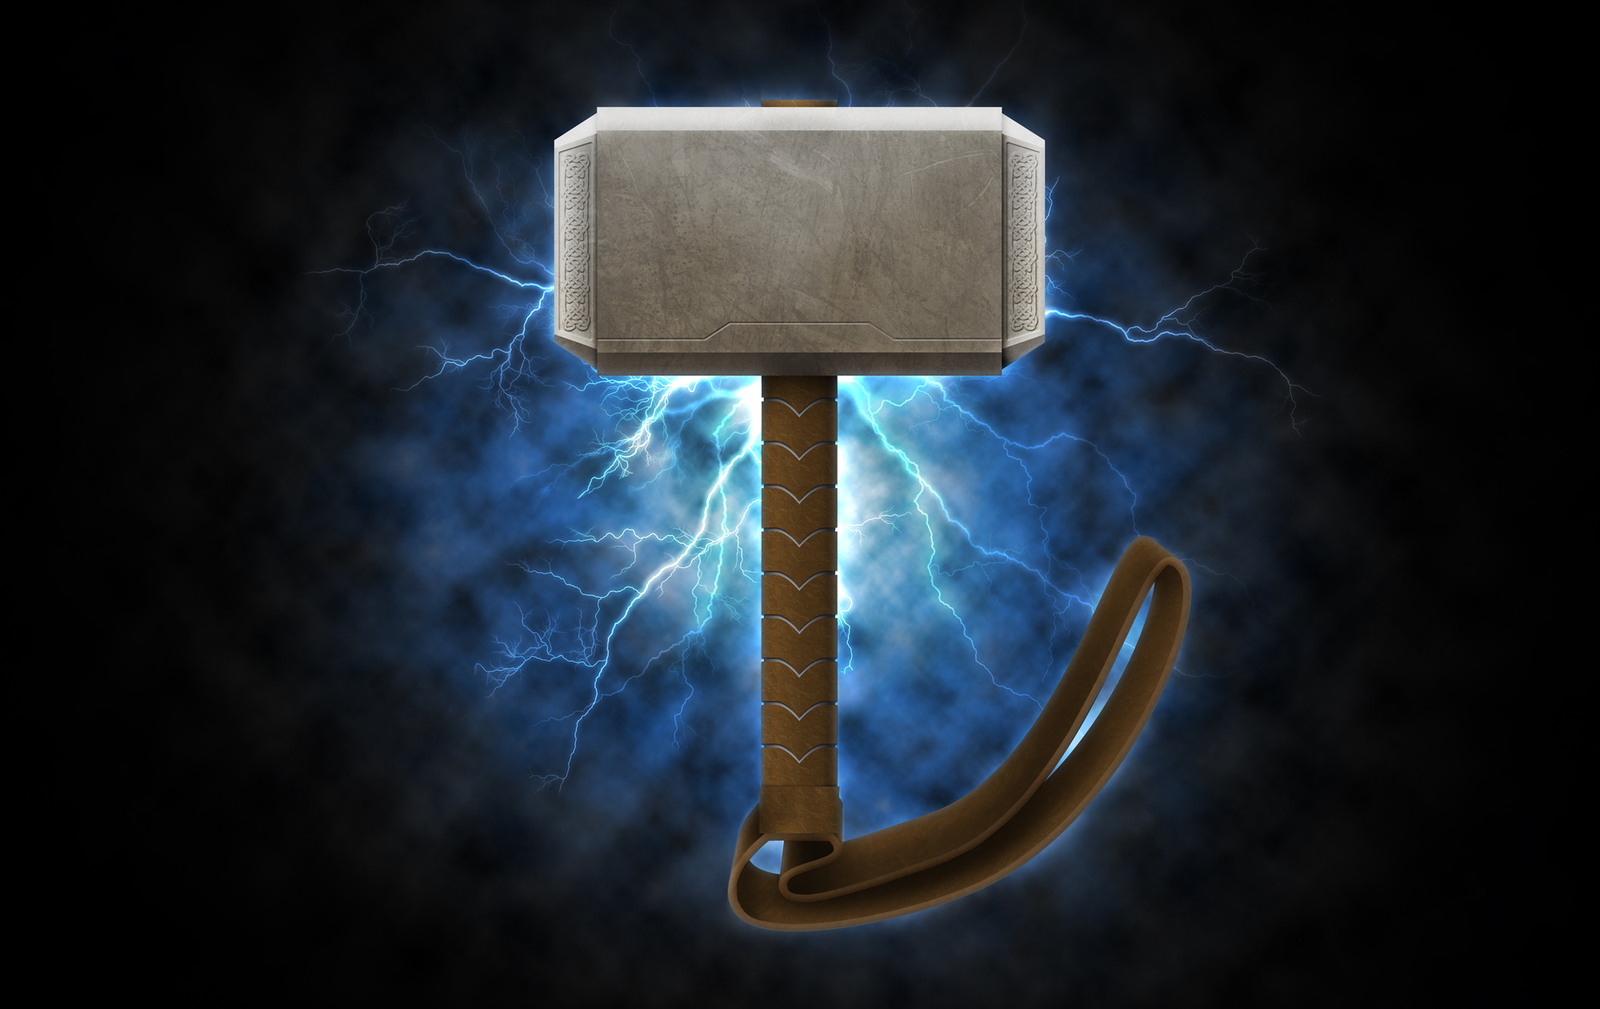 48 Thor S Hammer Wallpaper On Wallpapersafari